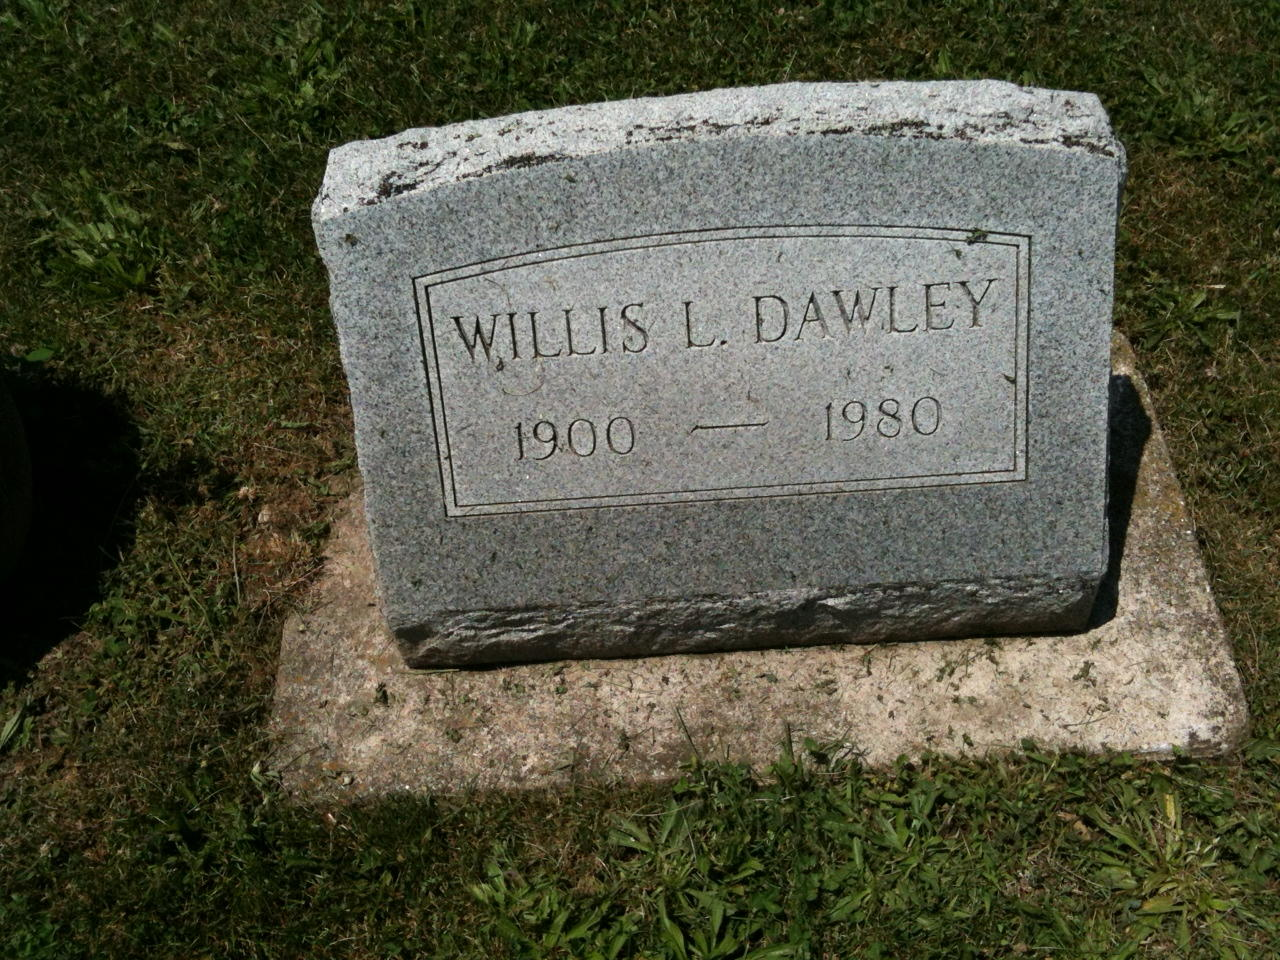 Willis Lee Dawley